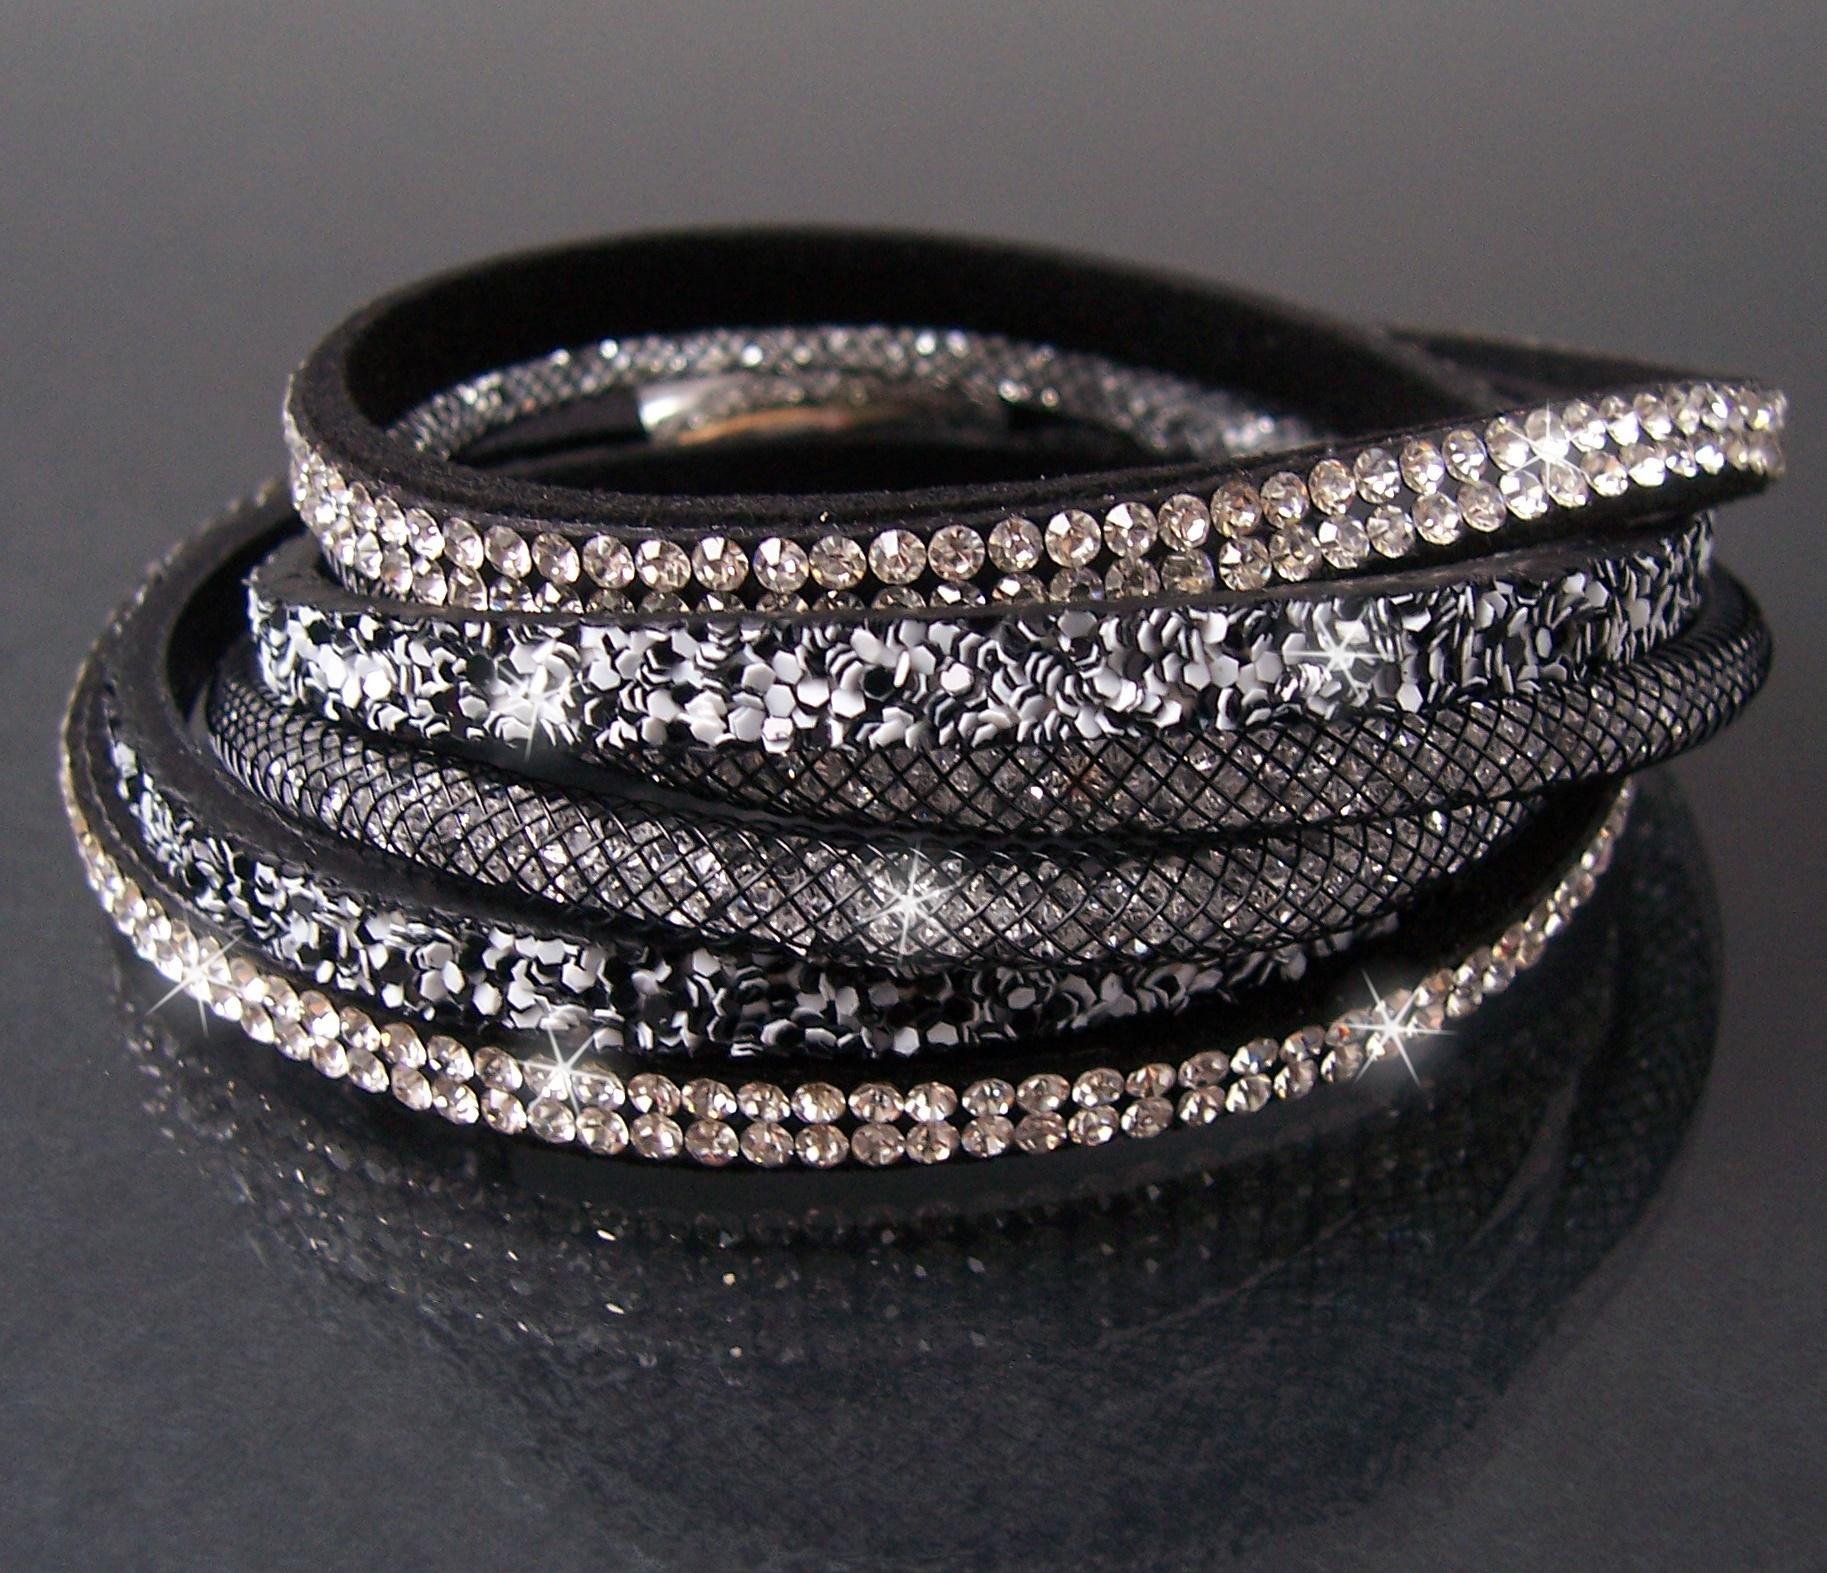 2-fach Slakearmband Armband Leder Glitzer Strass Schwarz-weiß A443